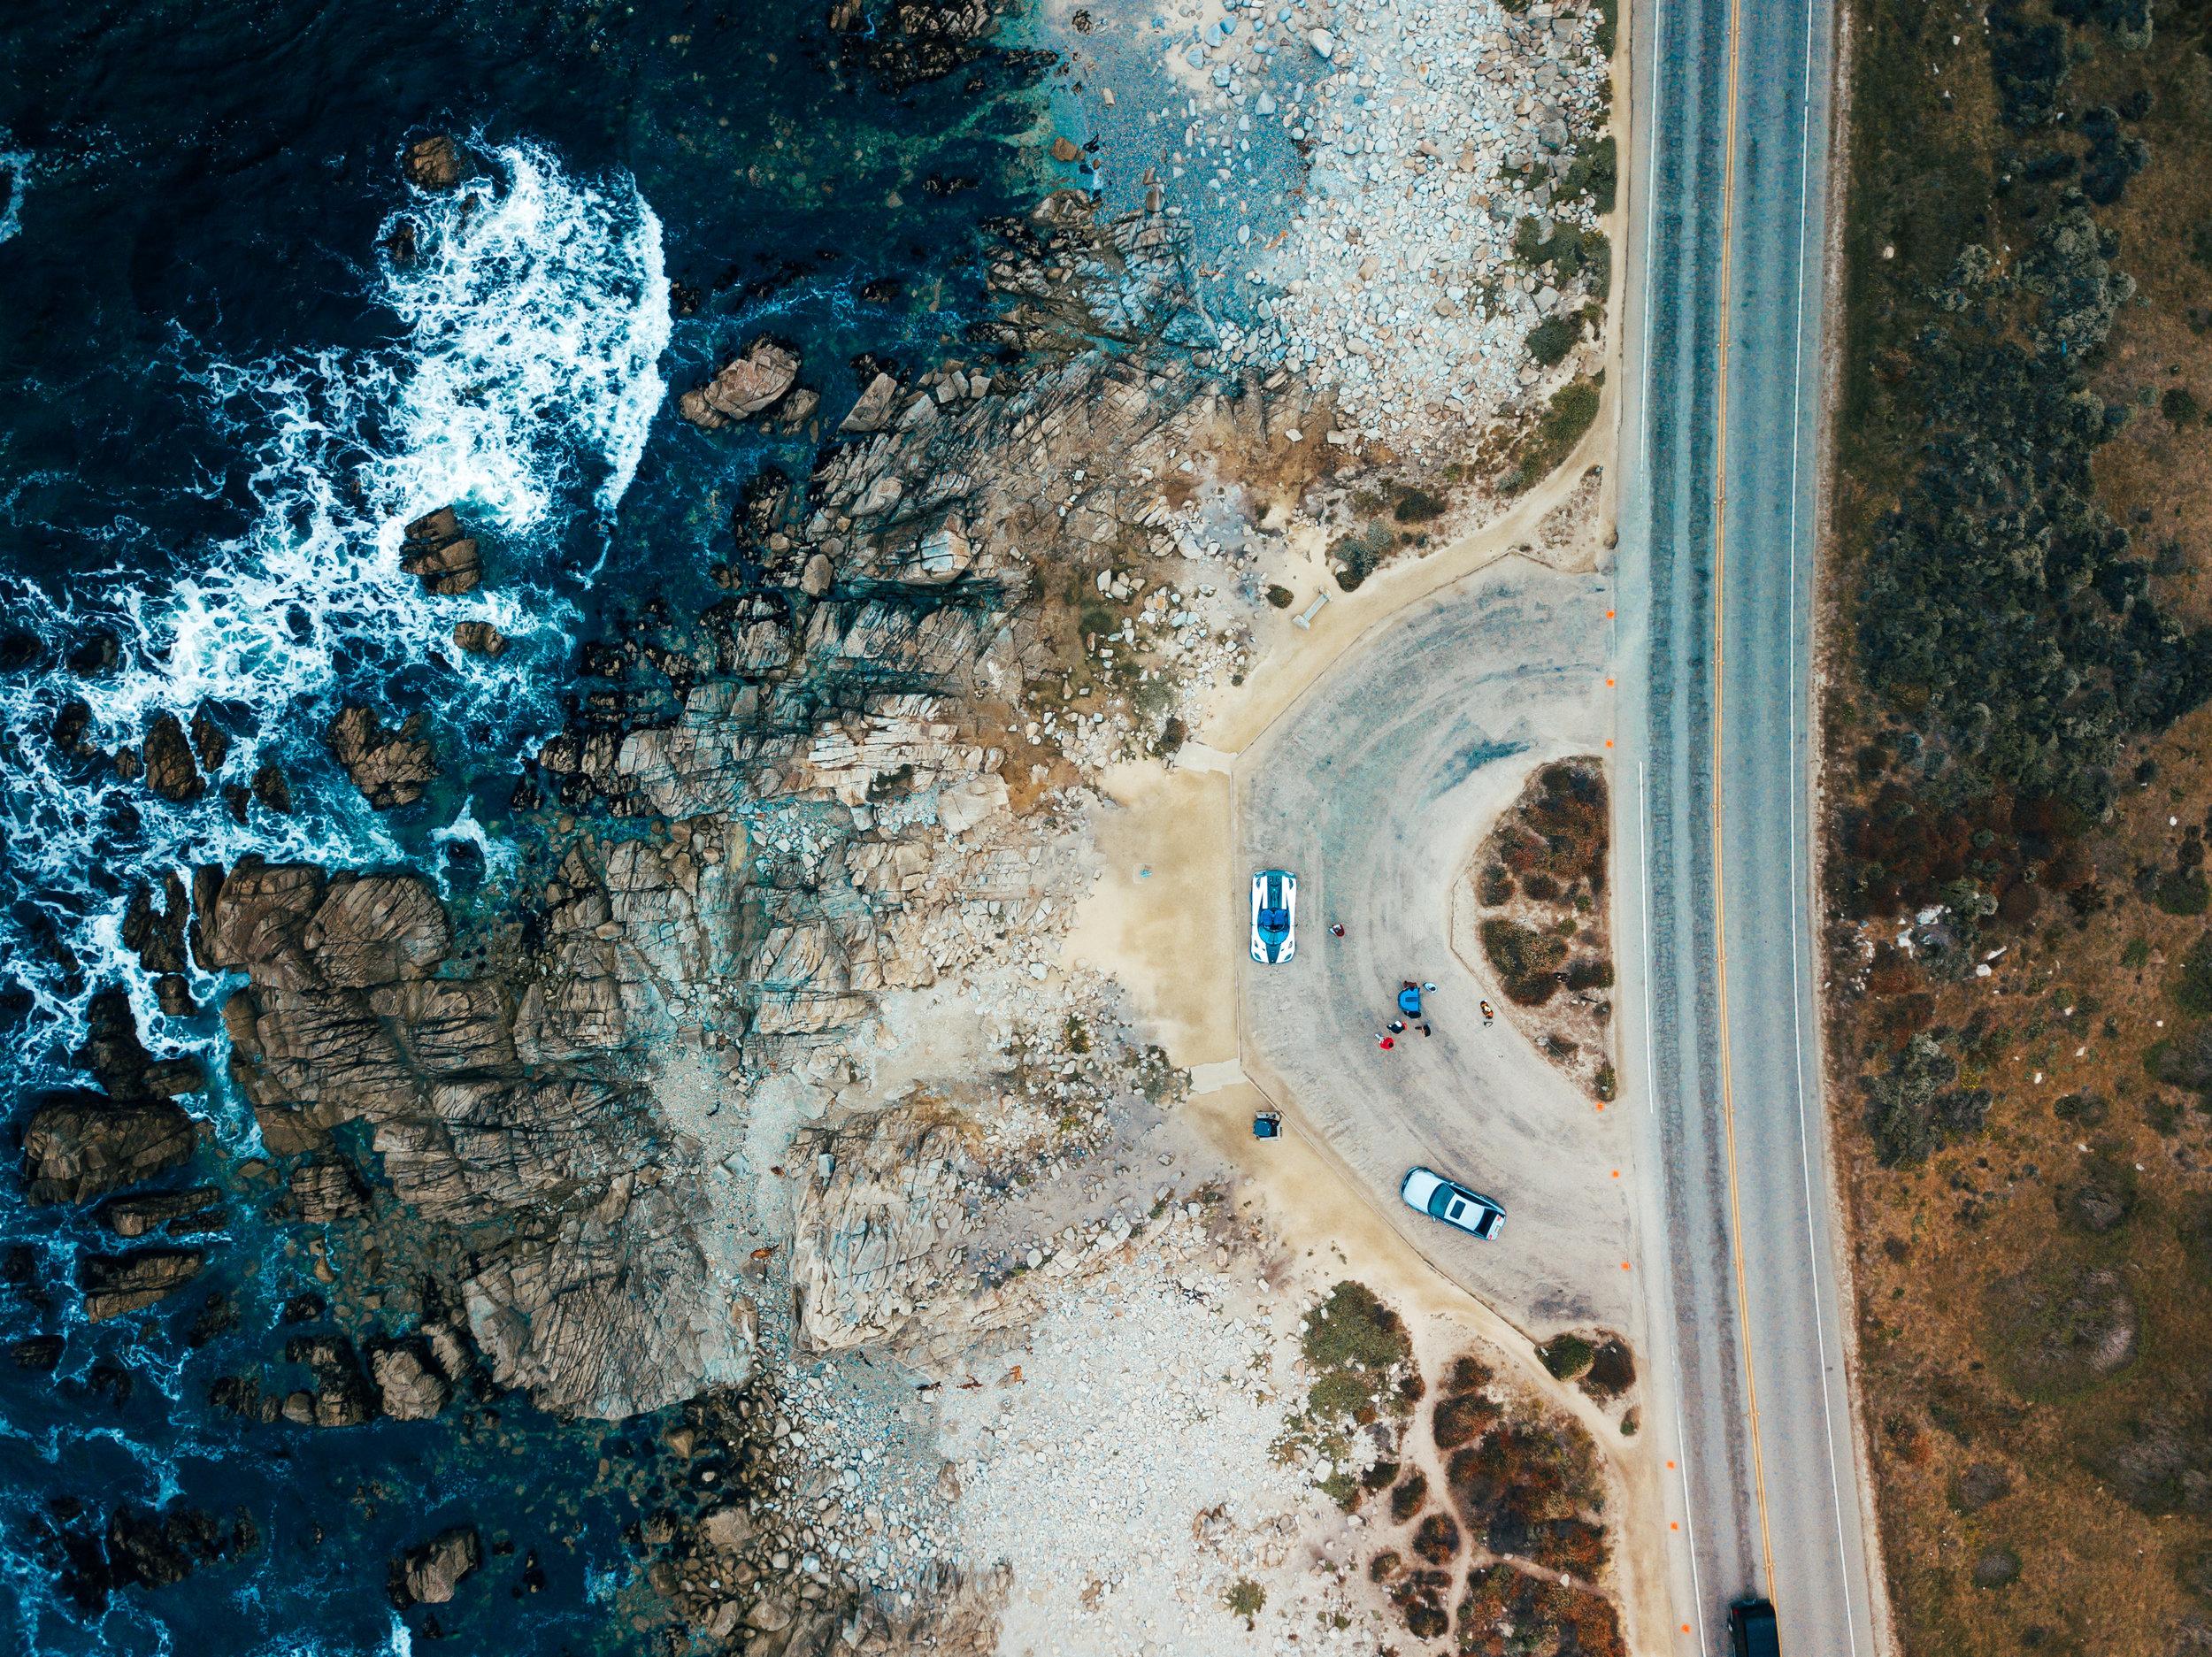 Stay_Driven_Monterey_Car_Week_Whitesse_Koenigsegg-7.jpg